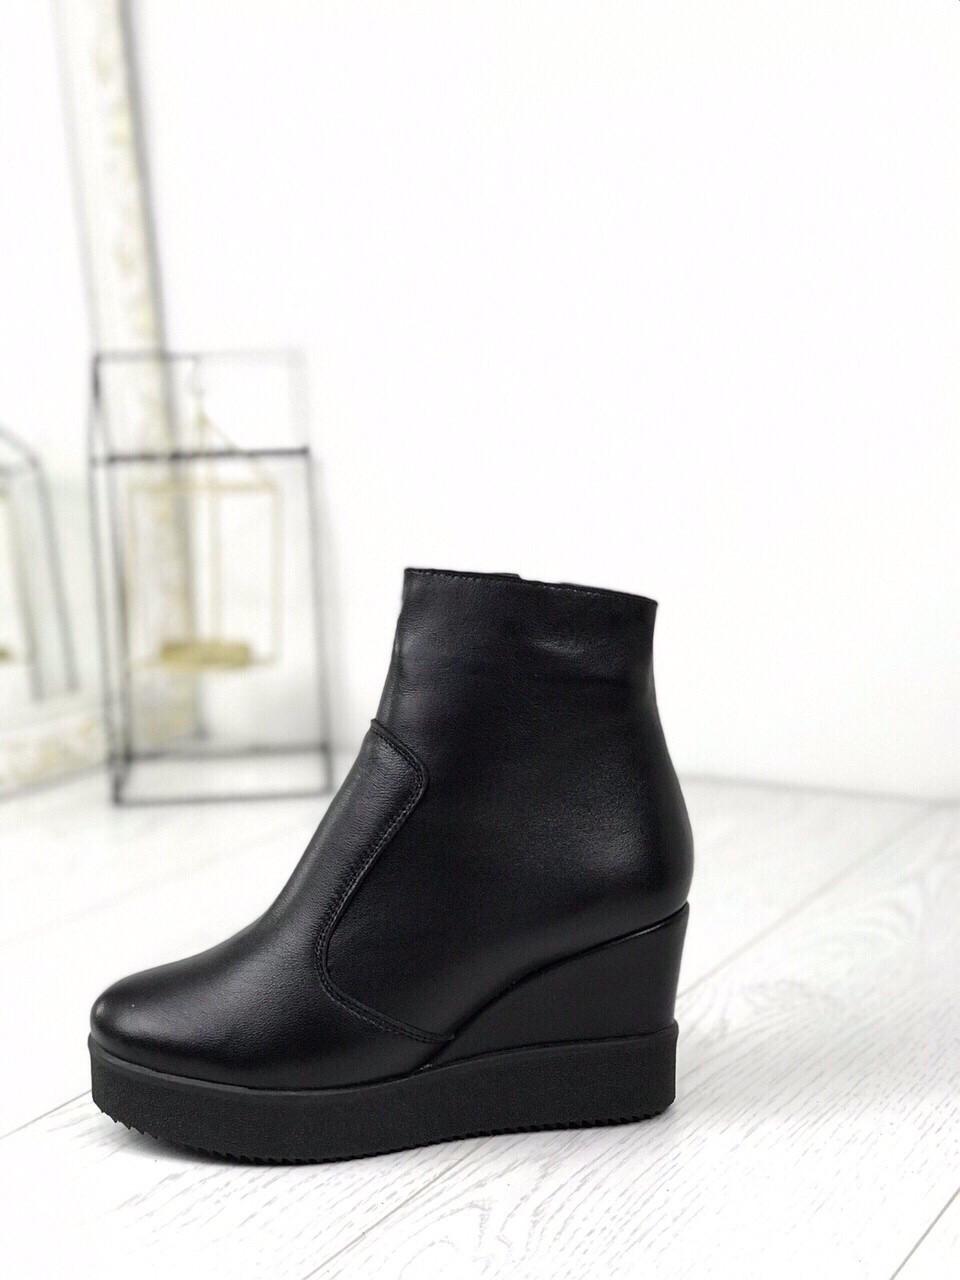 Кожаные ботинки на танкетке